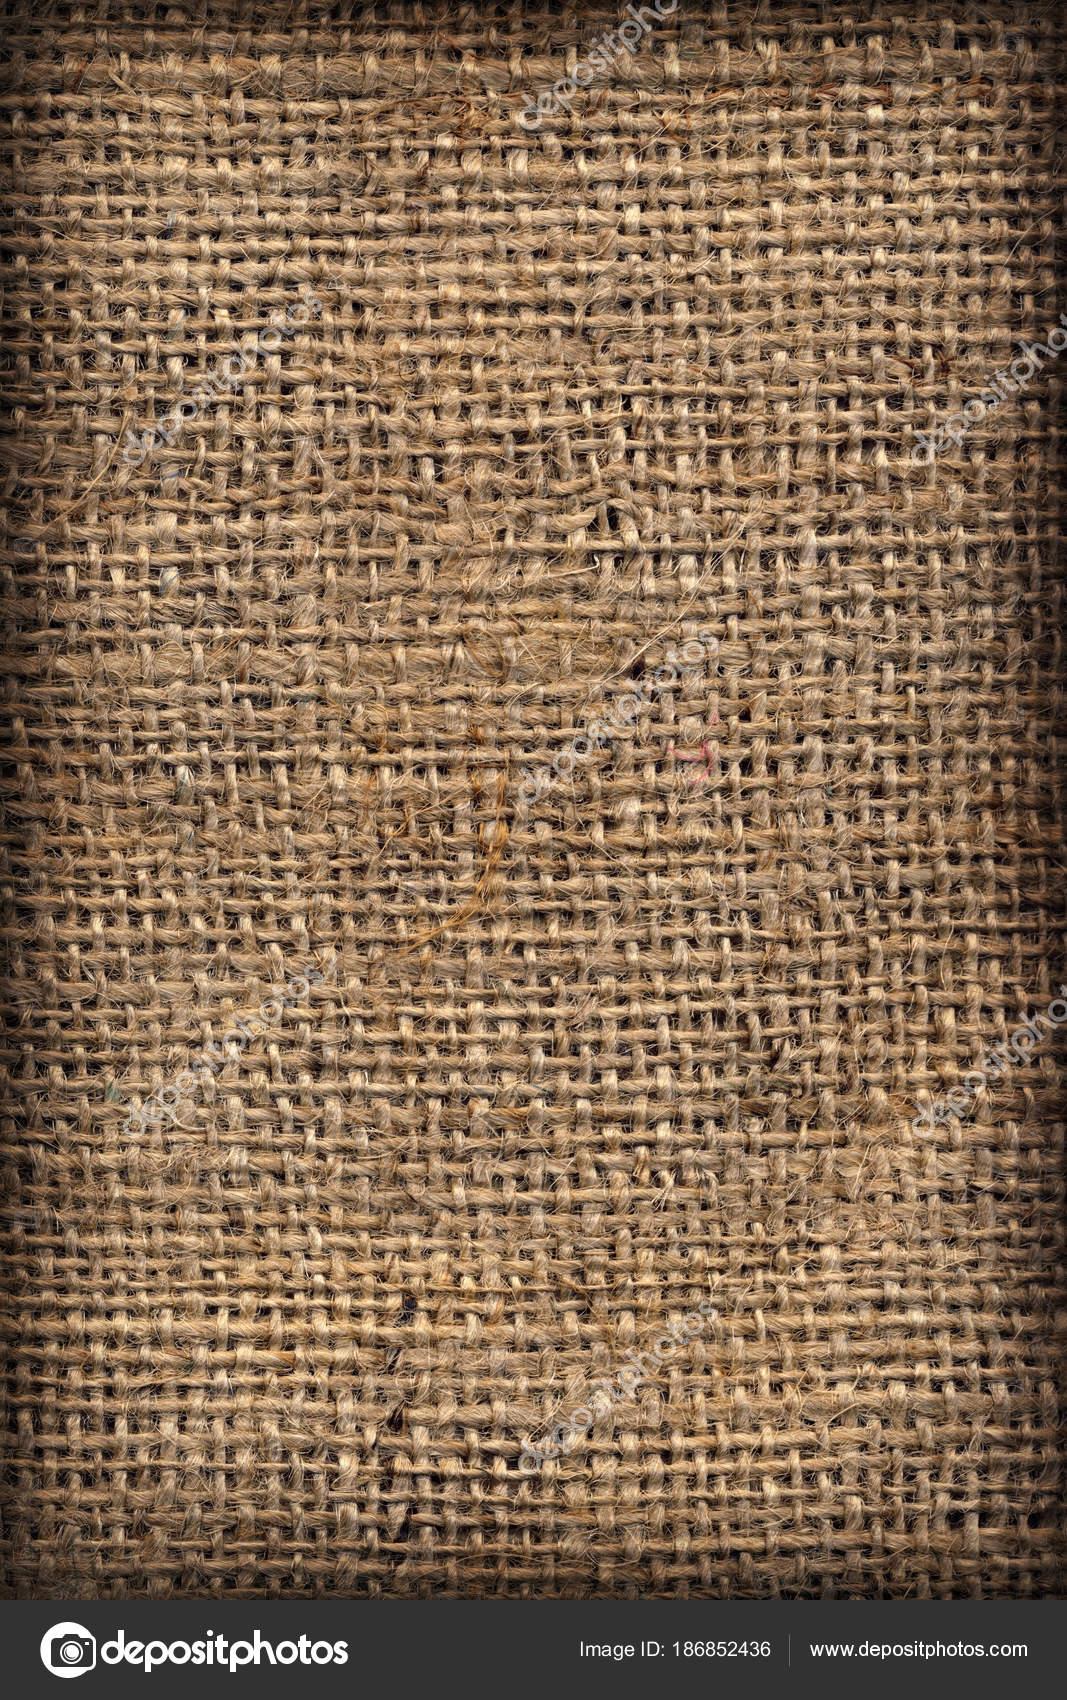 High Resolution Natural Brown Burlap Canvas Coarse Grain Vignette Grunge Background Texture Stock Photo